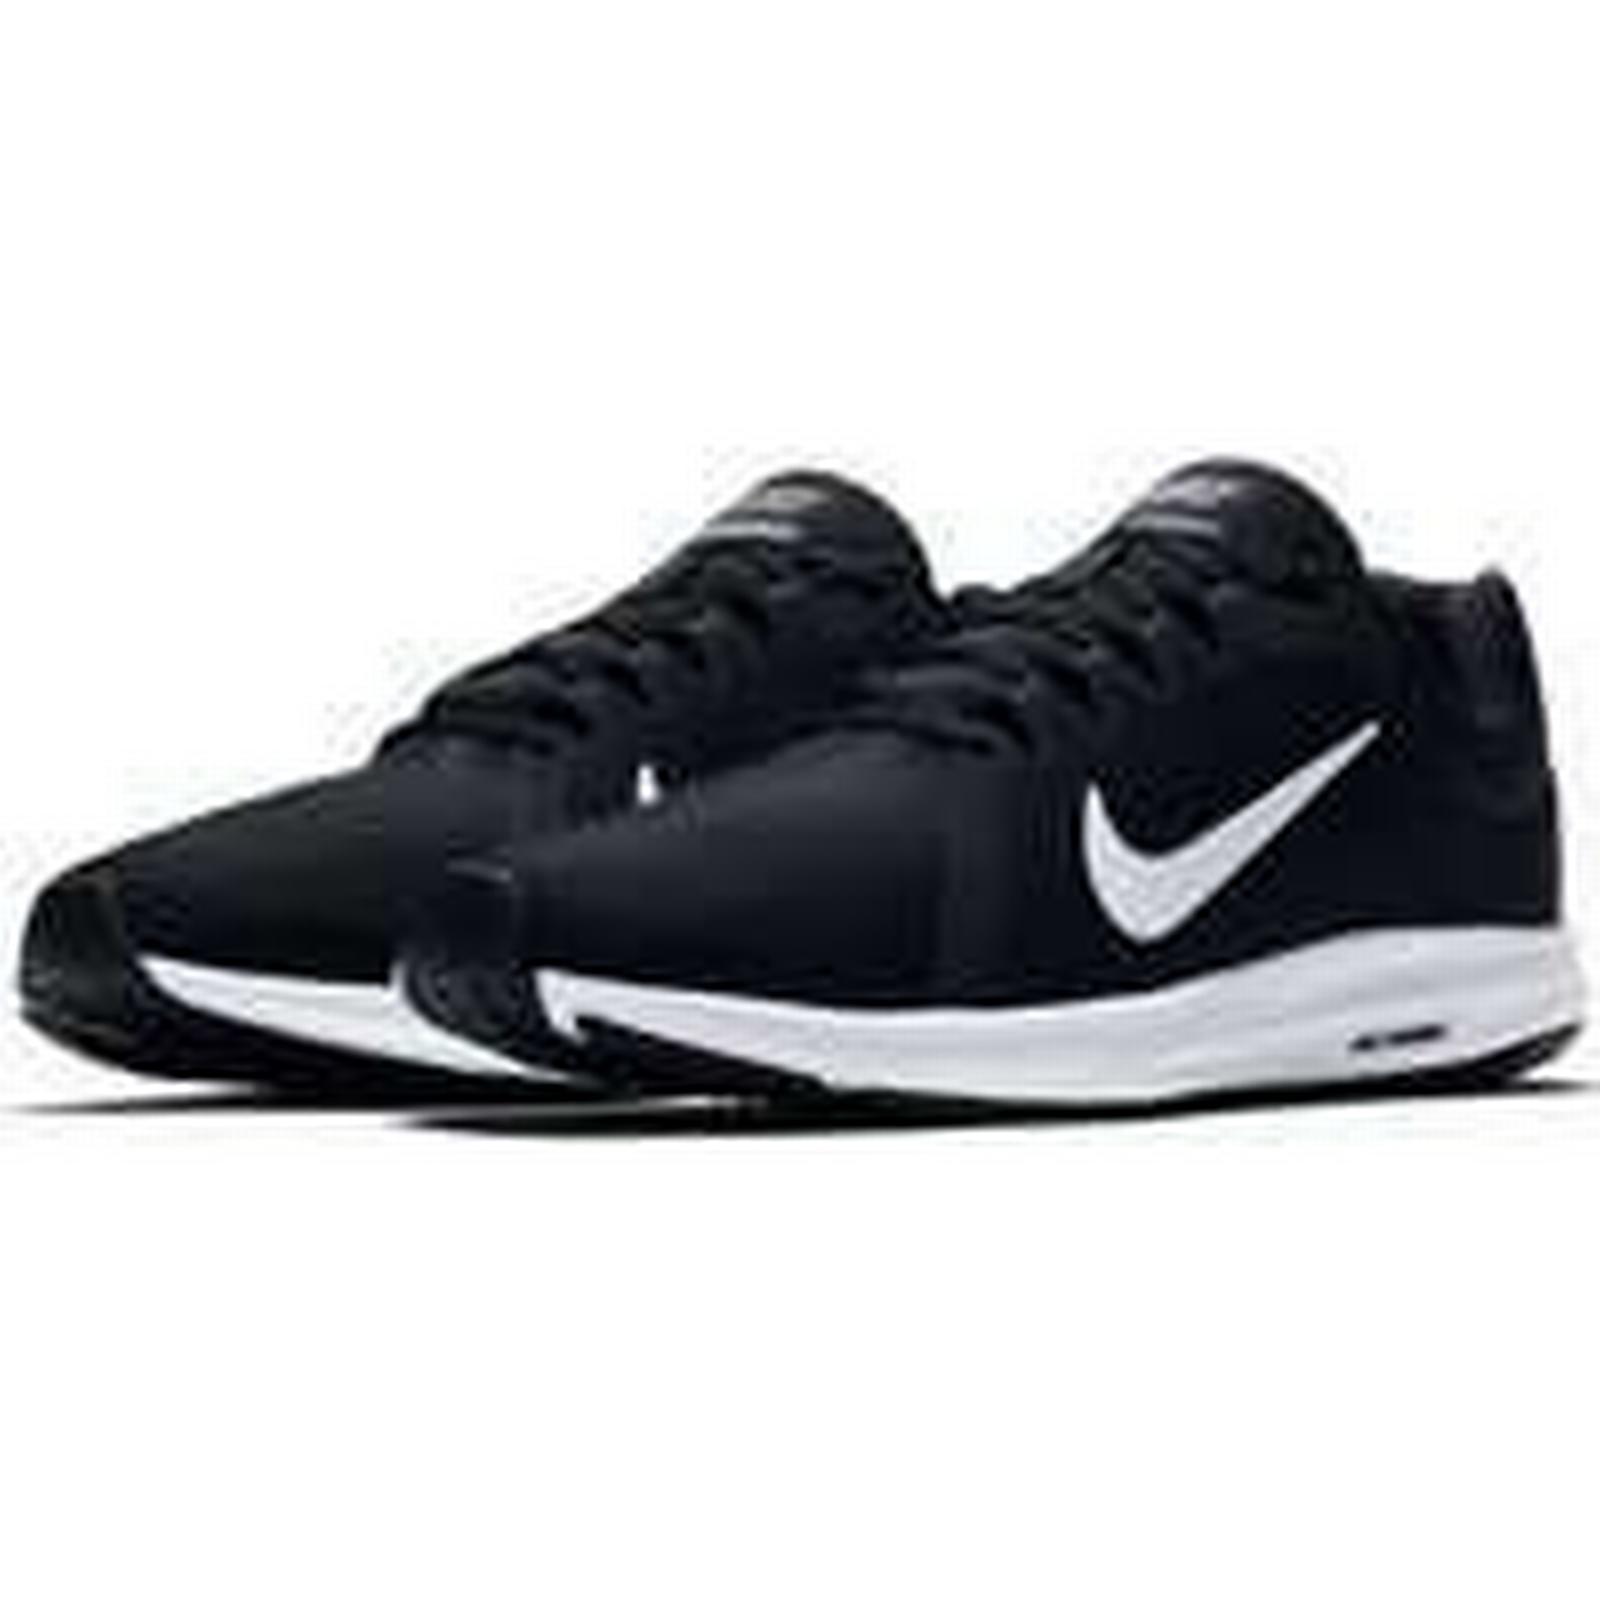 Spartoo.co.uk Nike Men's Downshifter men's 8 Running Shoe 908984 men's Downshifter Shoes (Trainers) in Black e636f0